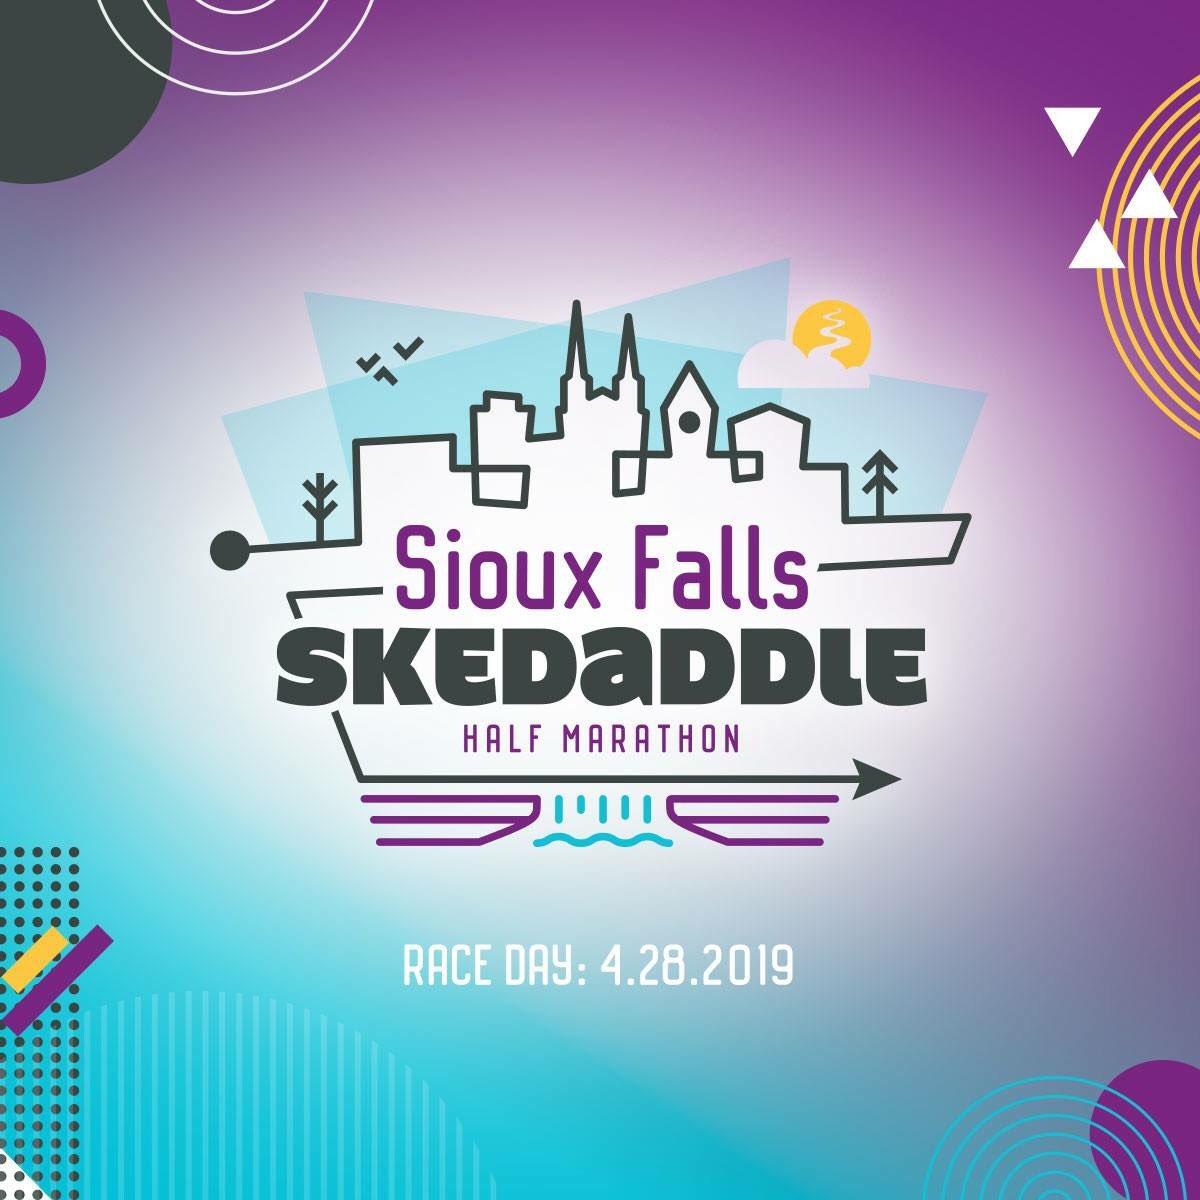 d93a7ee76 Get ready, Sioux Falls... This spring, we Skedaddle!  #SkedaddleRunpic.twitter.com/gkxLuxtkU5